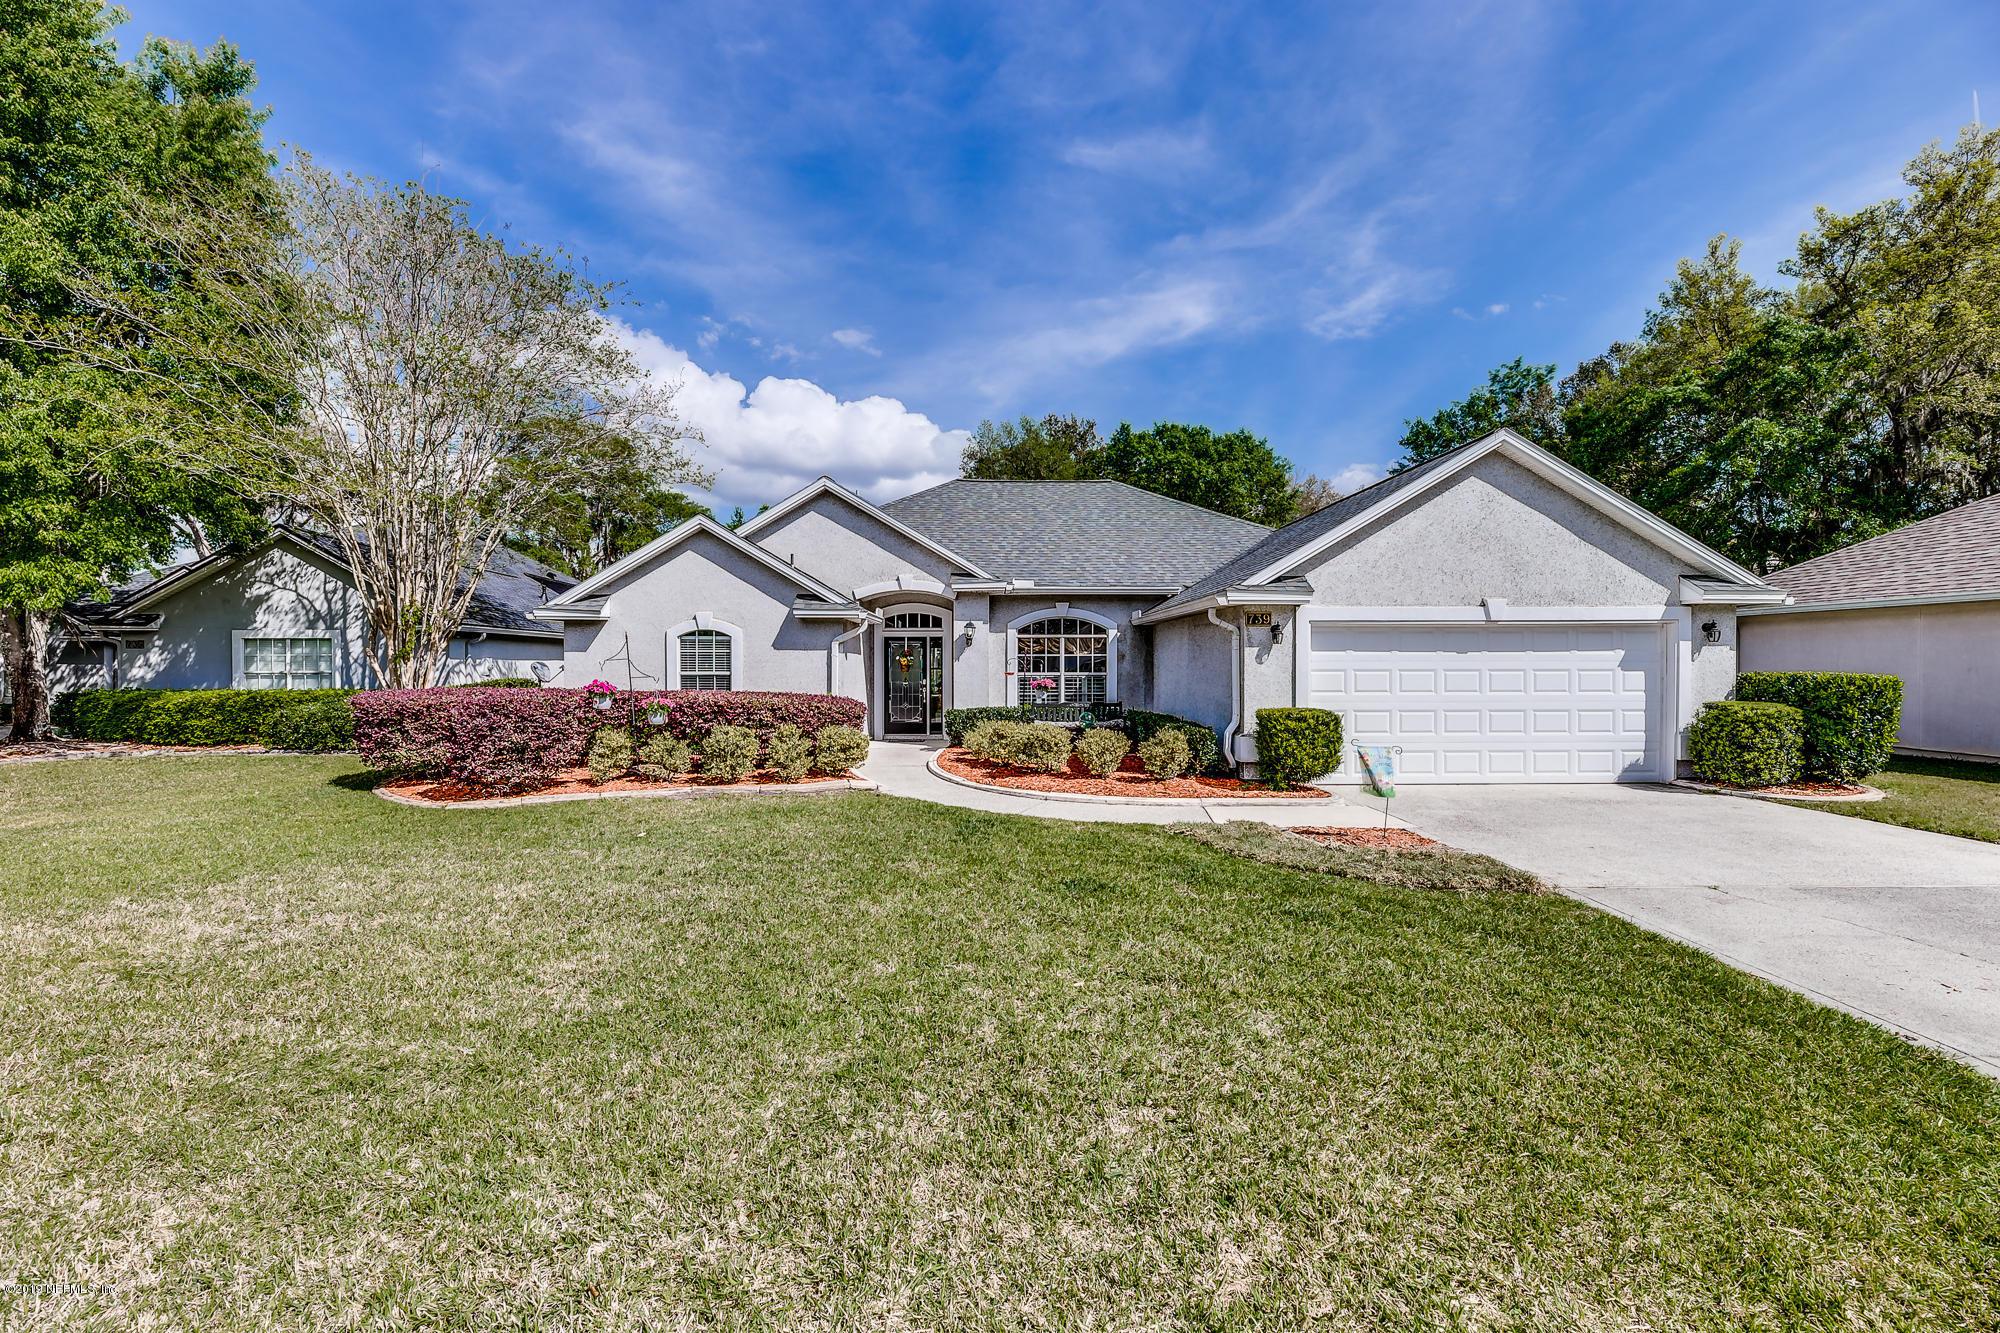 739 WESTMINSTER, ORANGE PARK, FLORIDA 32073, 4 Bedrooms Bedrooms, ,2 BathroomsBathrooms,Residential - single family,For sale,WESTMINSTER,989225